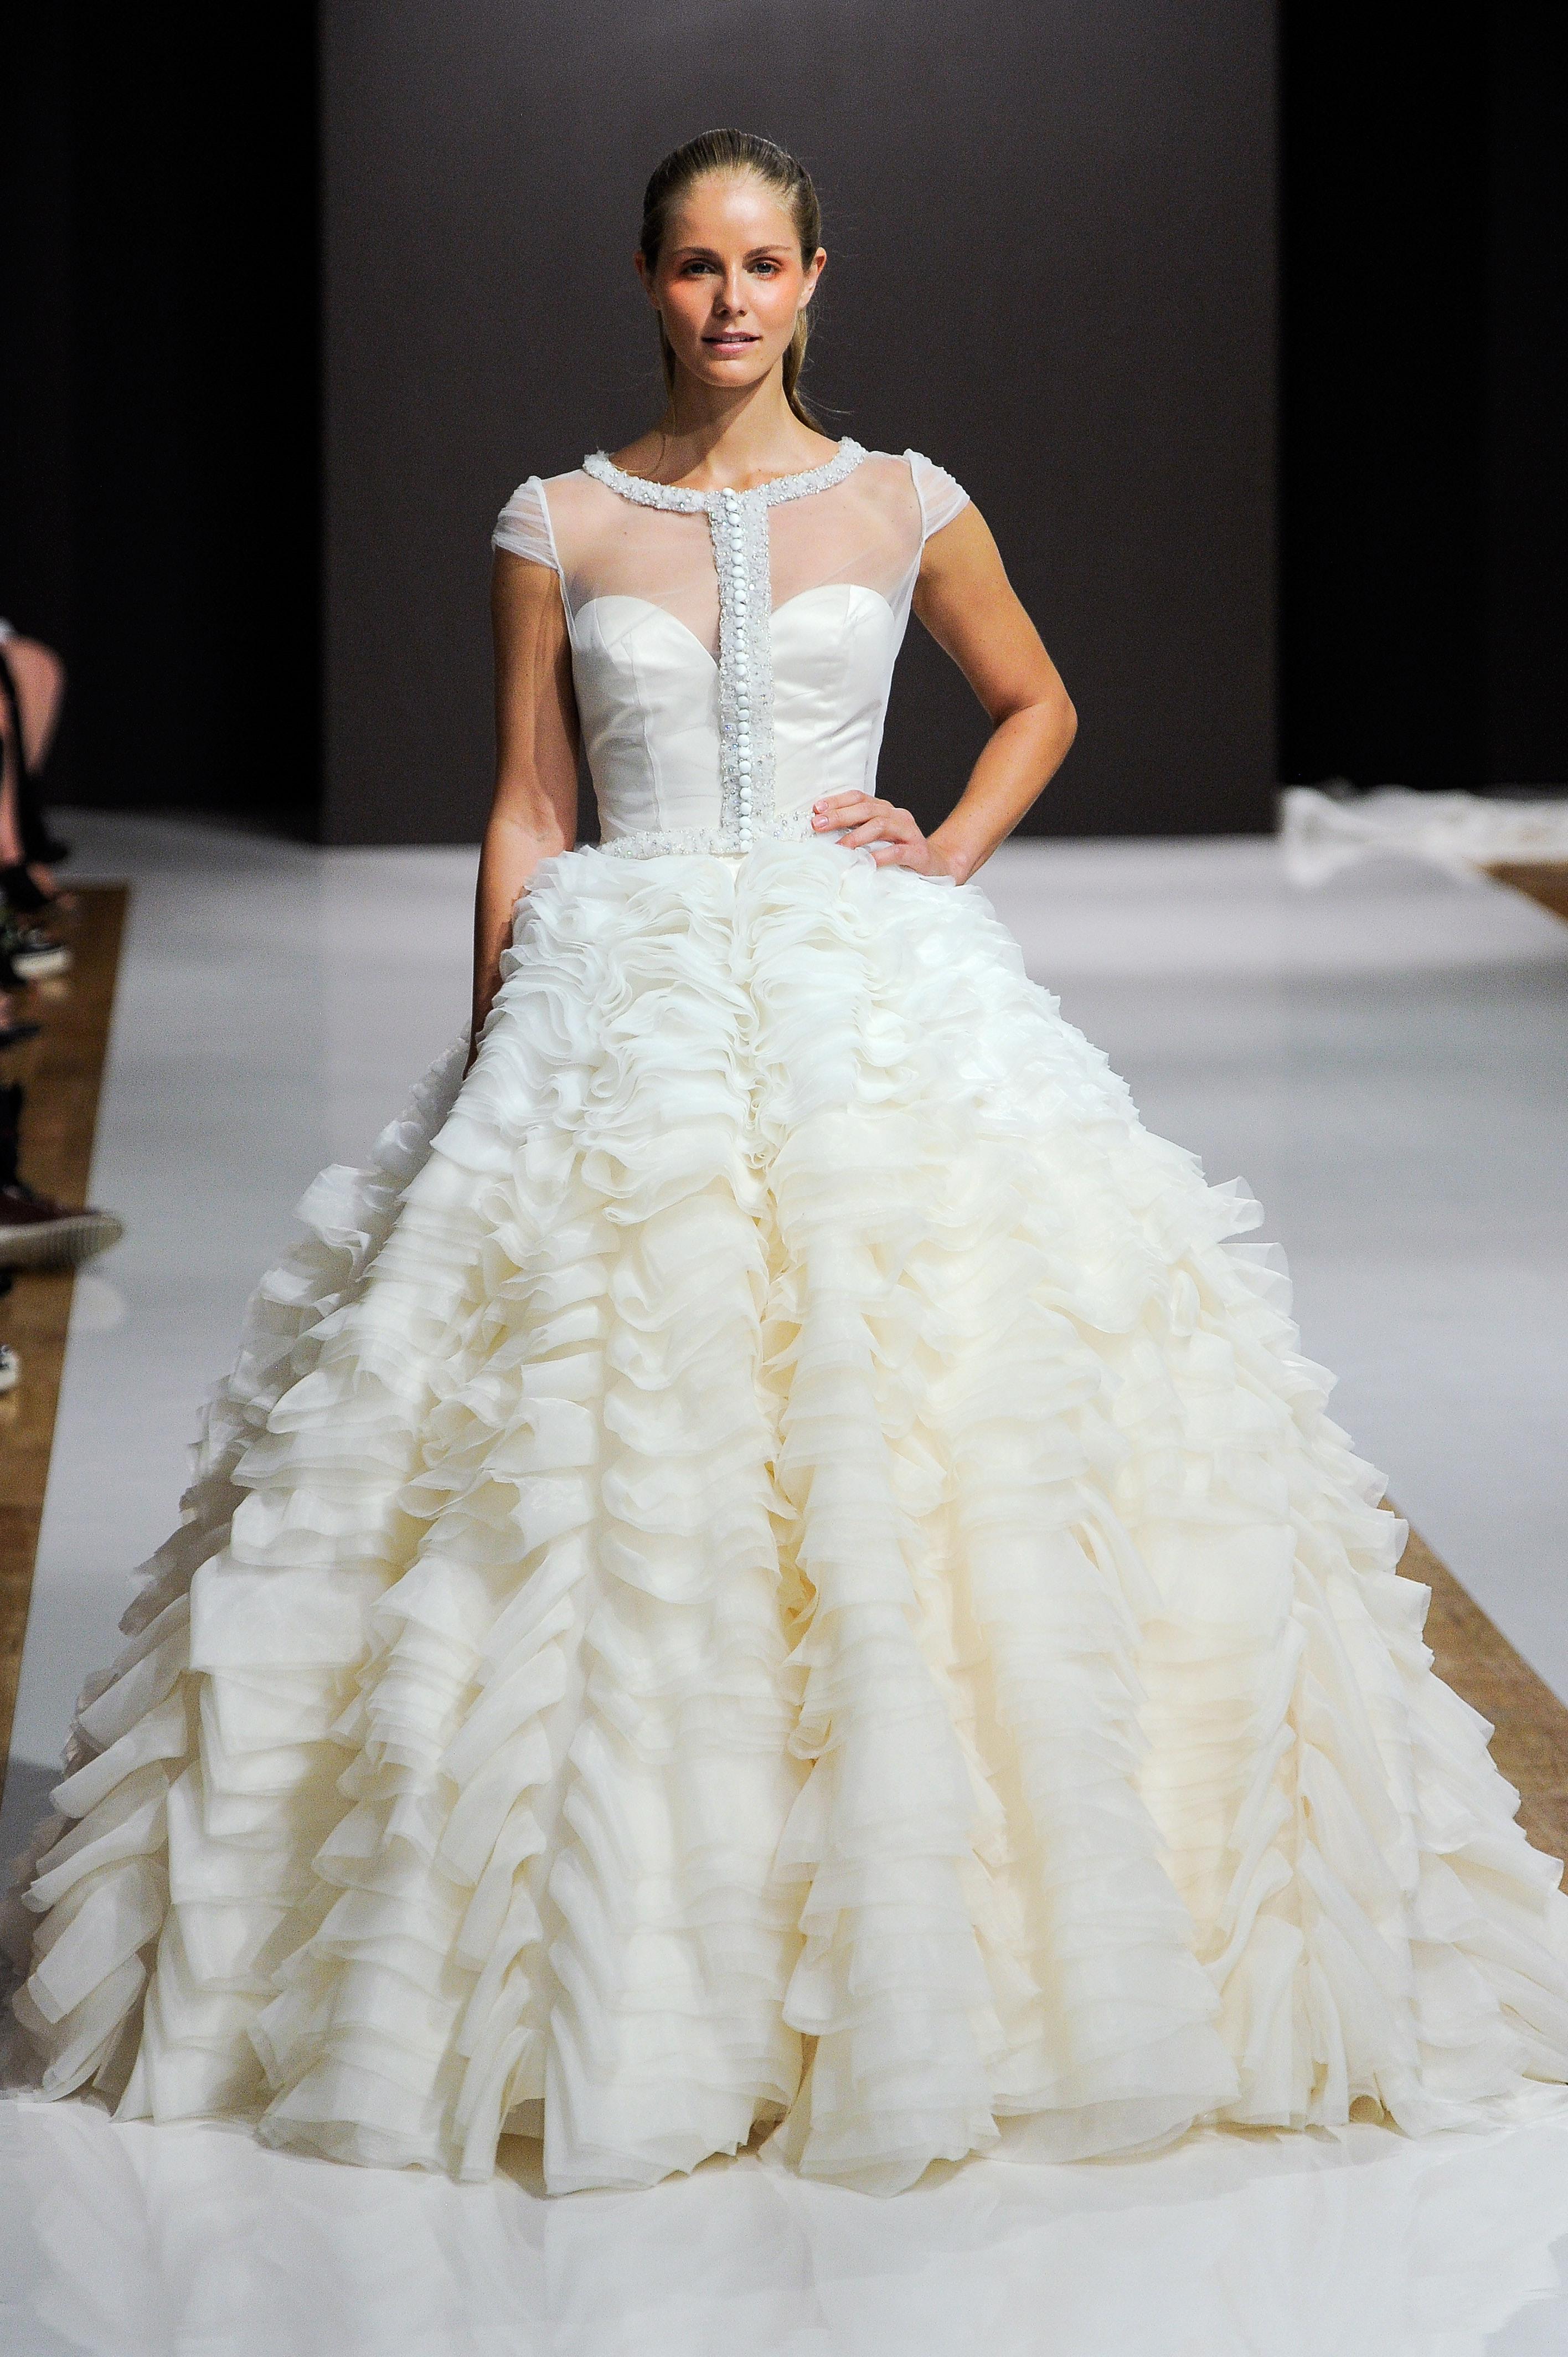 mark zunino wedding dress fall 2018 ruffles ball gown cap sleeves illusion neckline